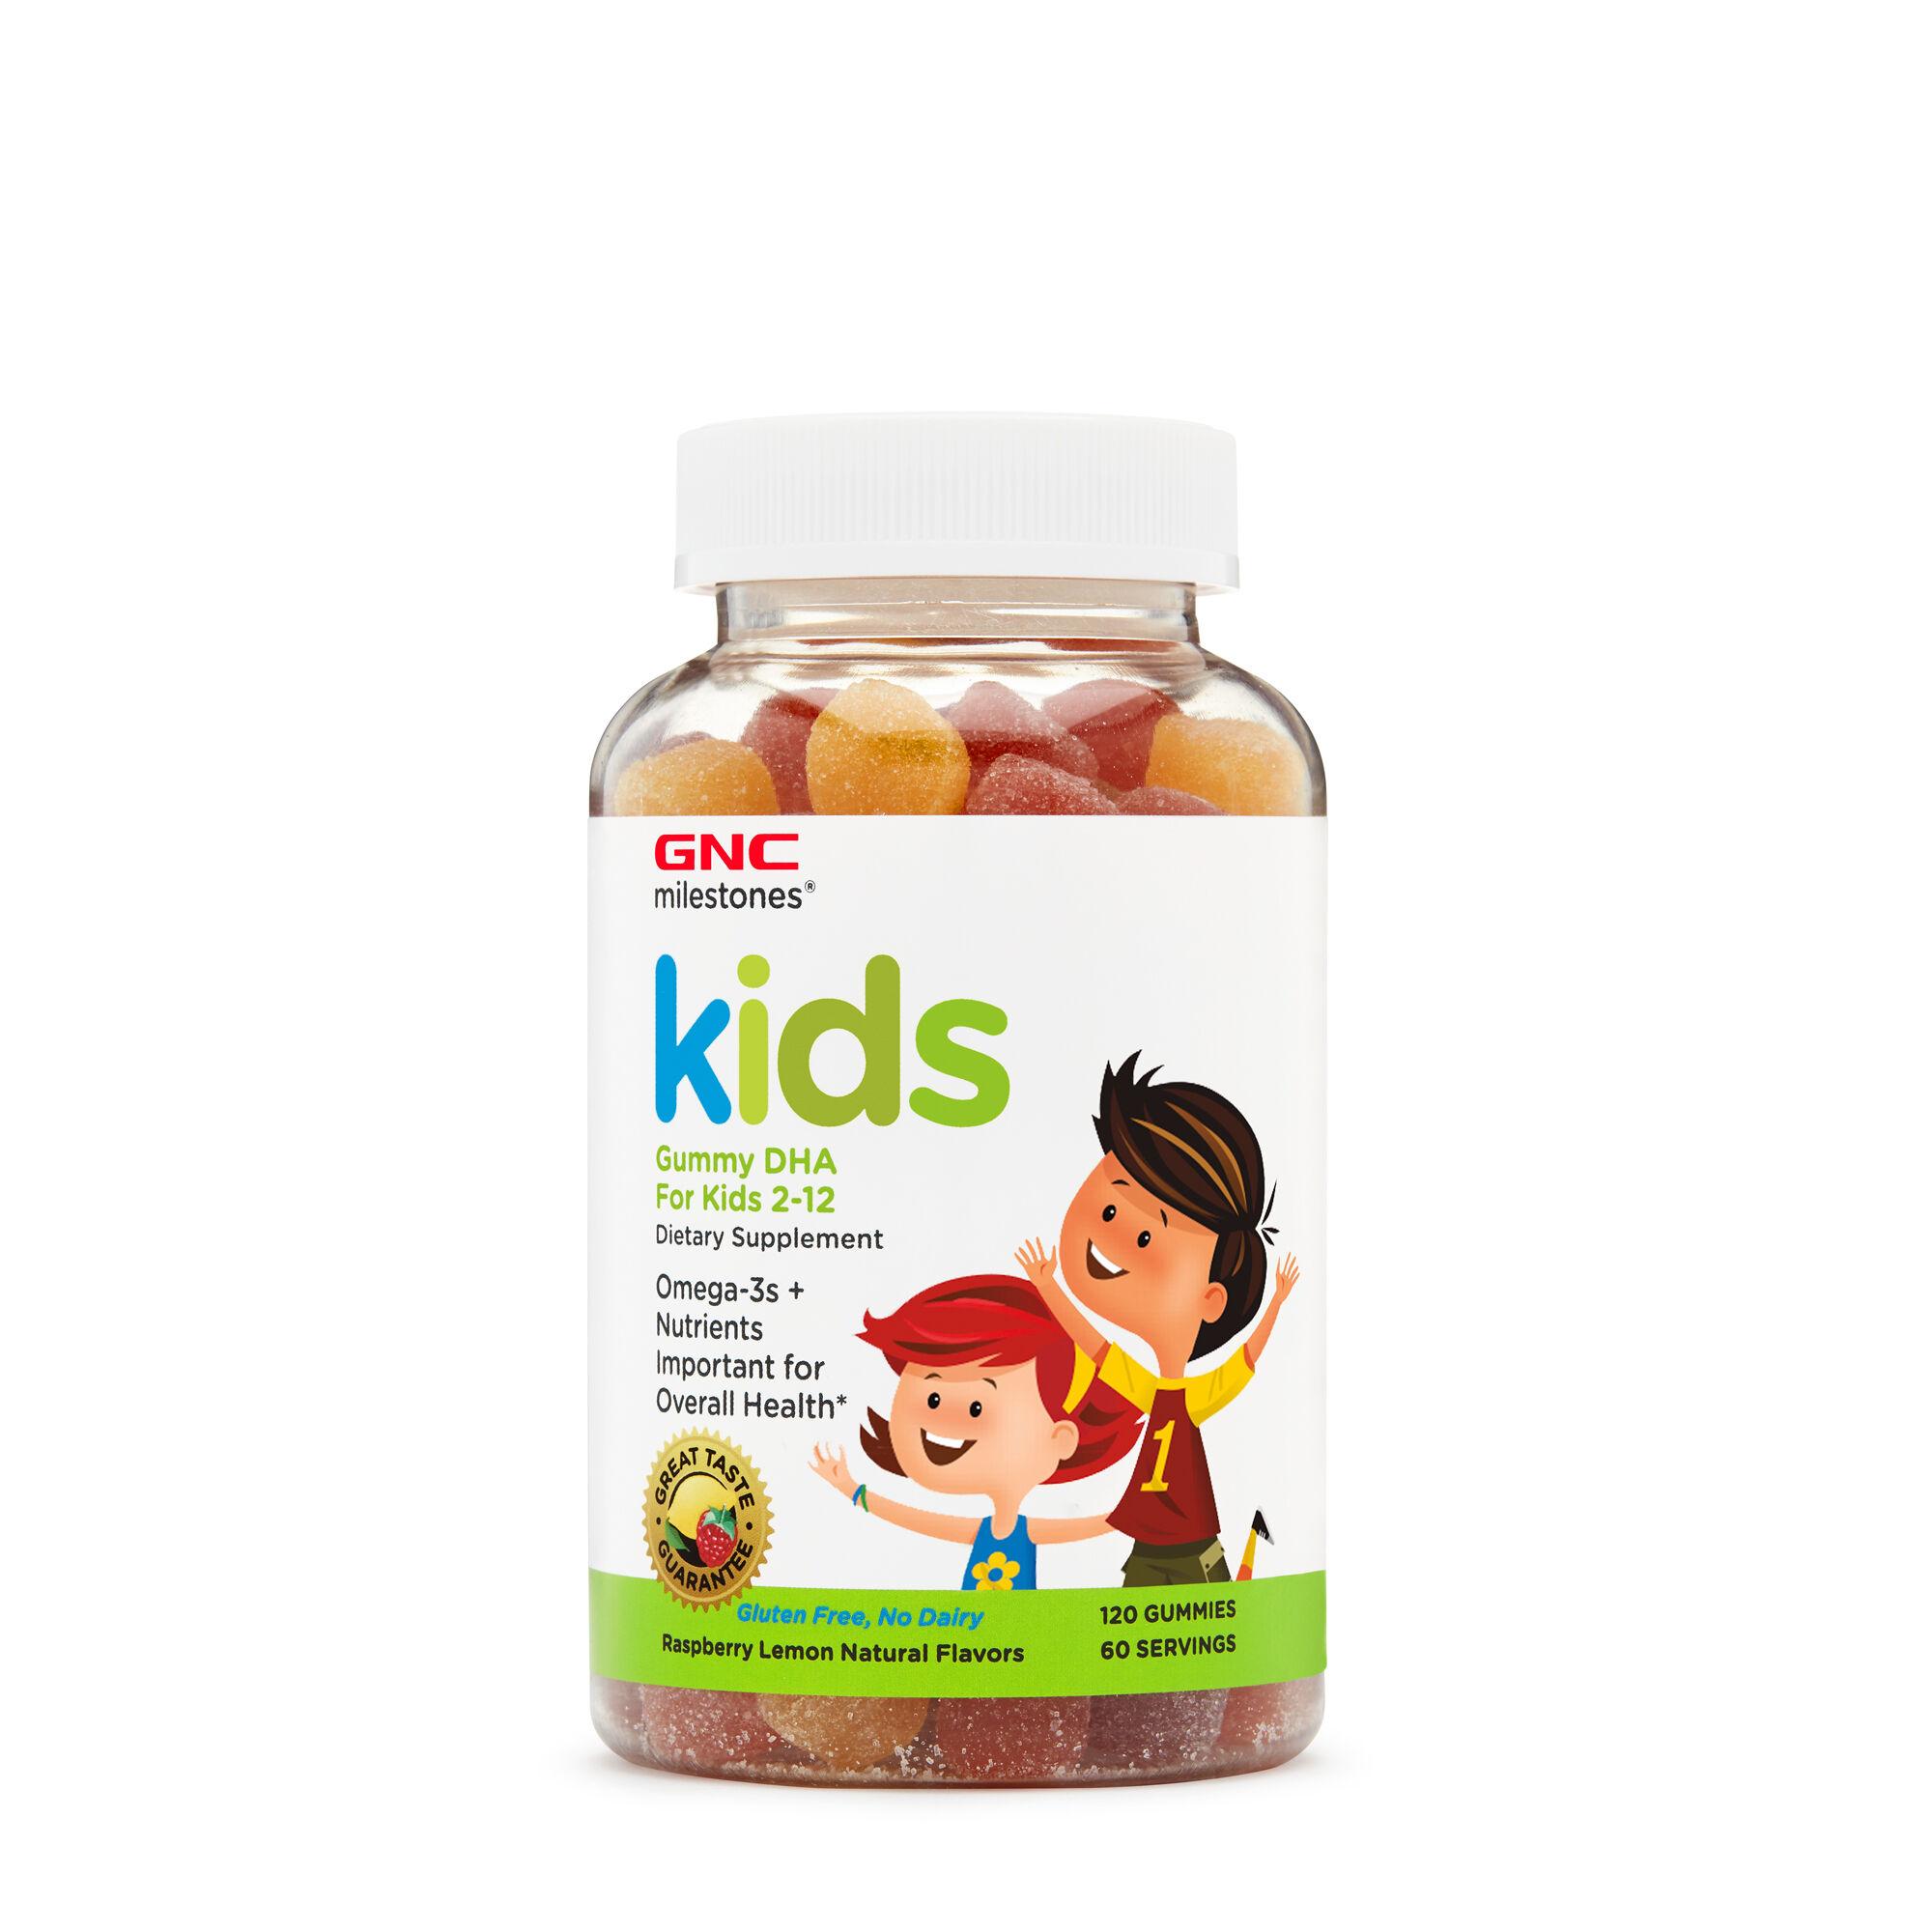 kids Gummy DHA for Kids 2-12